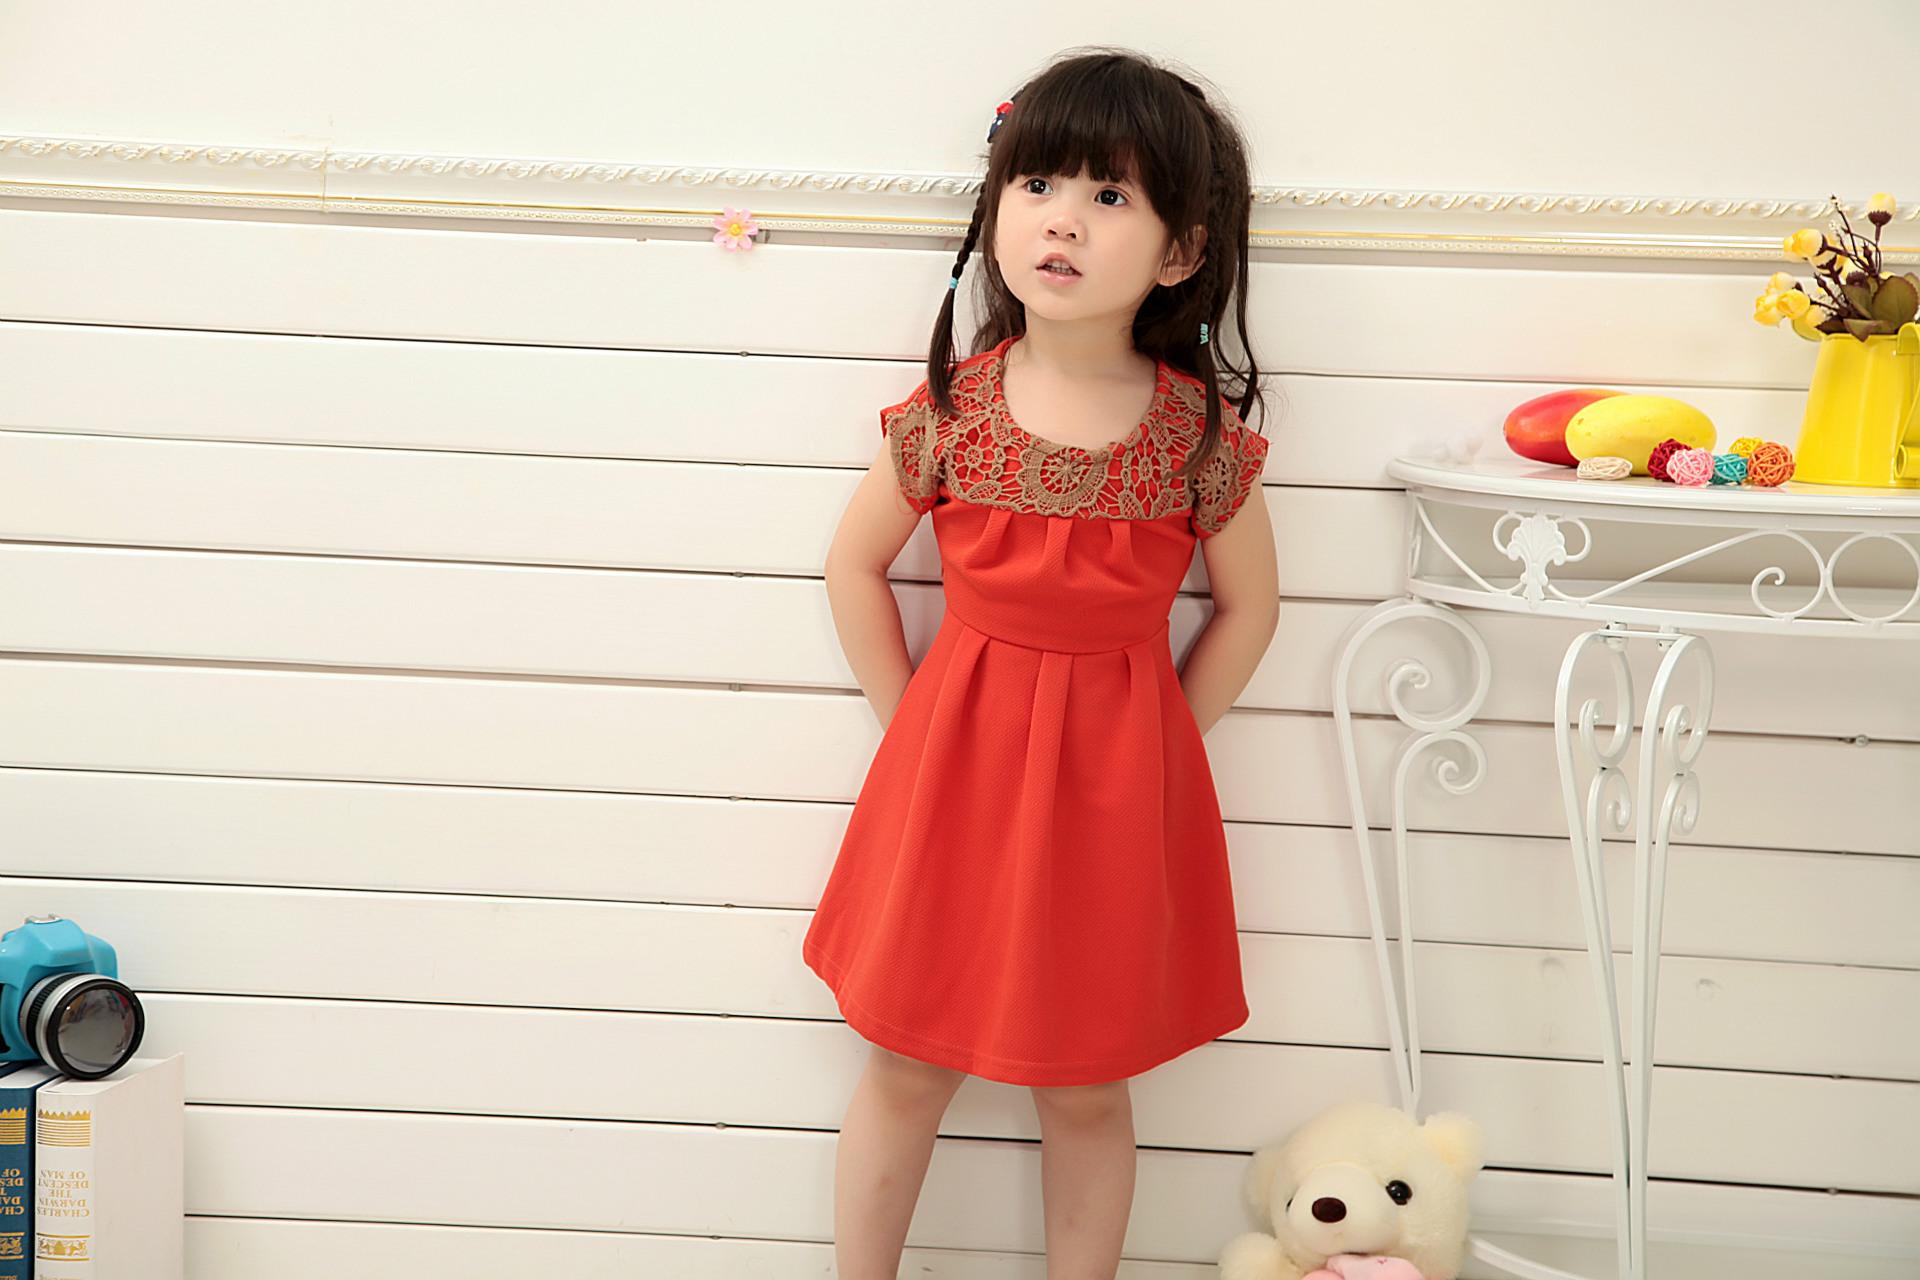 2015 Summer Style European Red China Lace Princess Girl Dress Kids Evening Wedding Party Dress Toddler Girl Clothing SHCYCC75(China (Mainland))